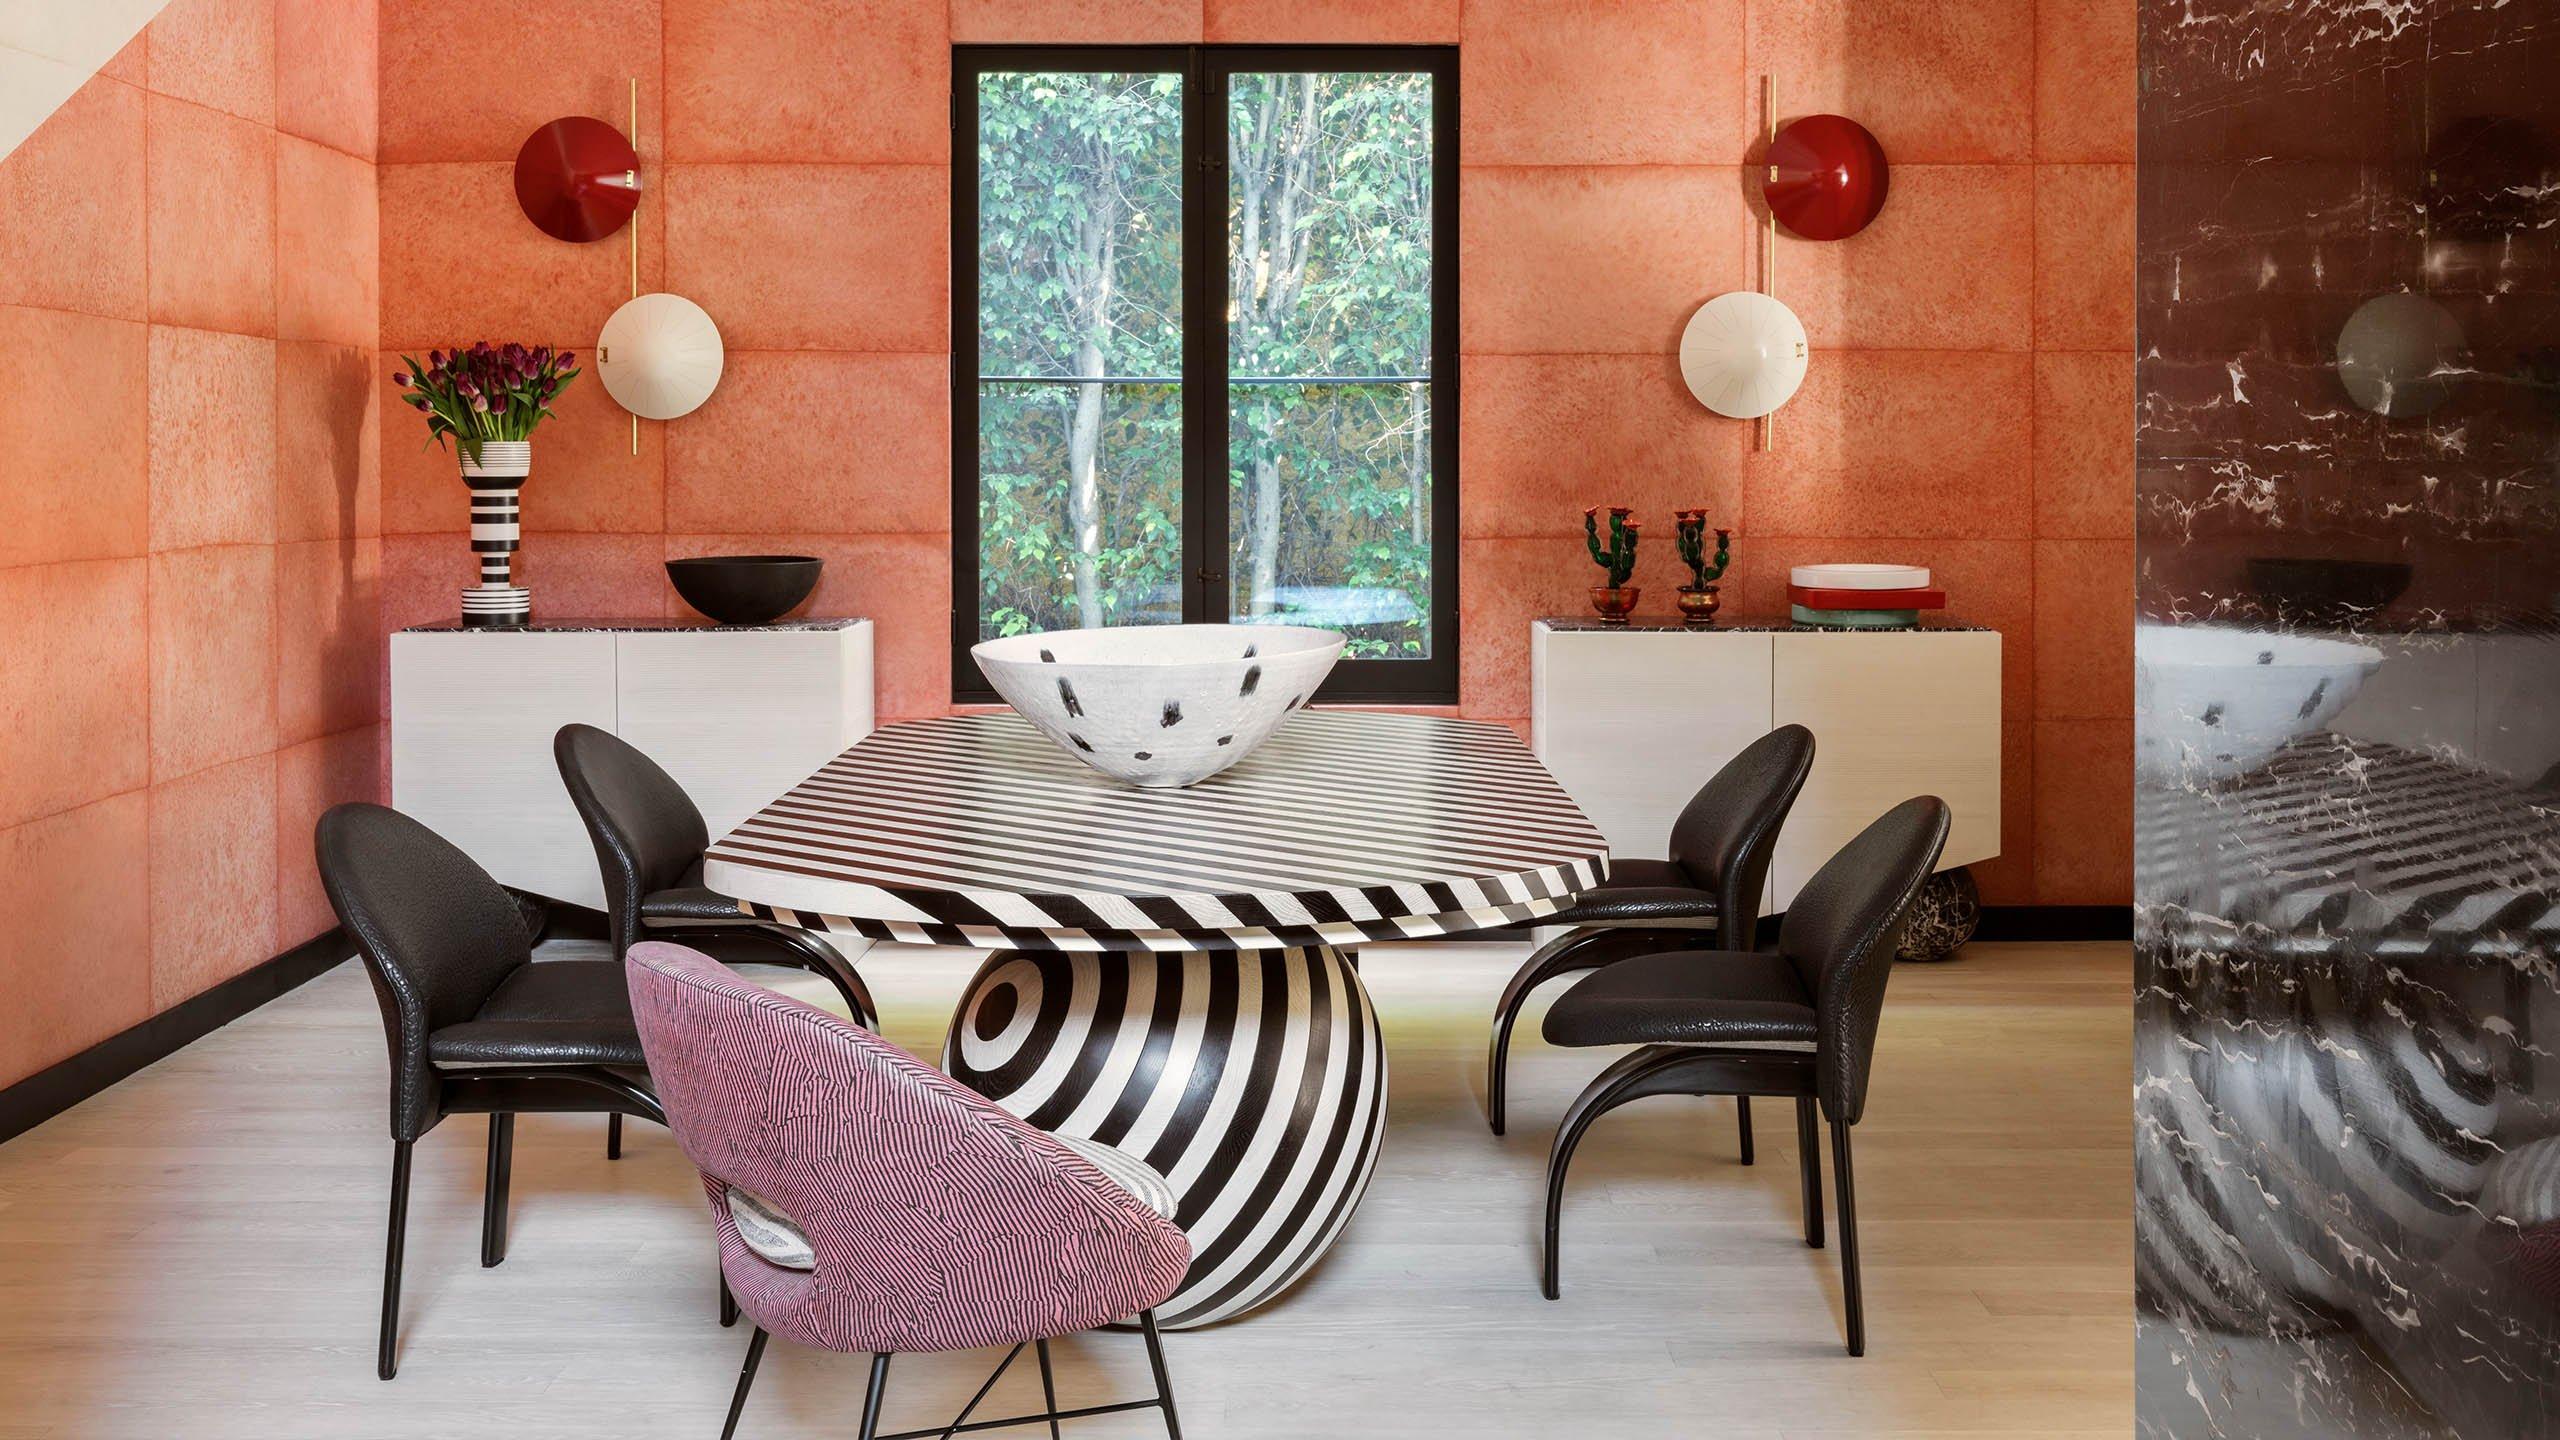 kelly wearstler instagram funky dining room